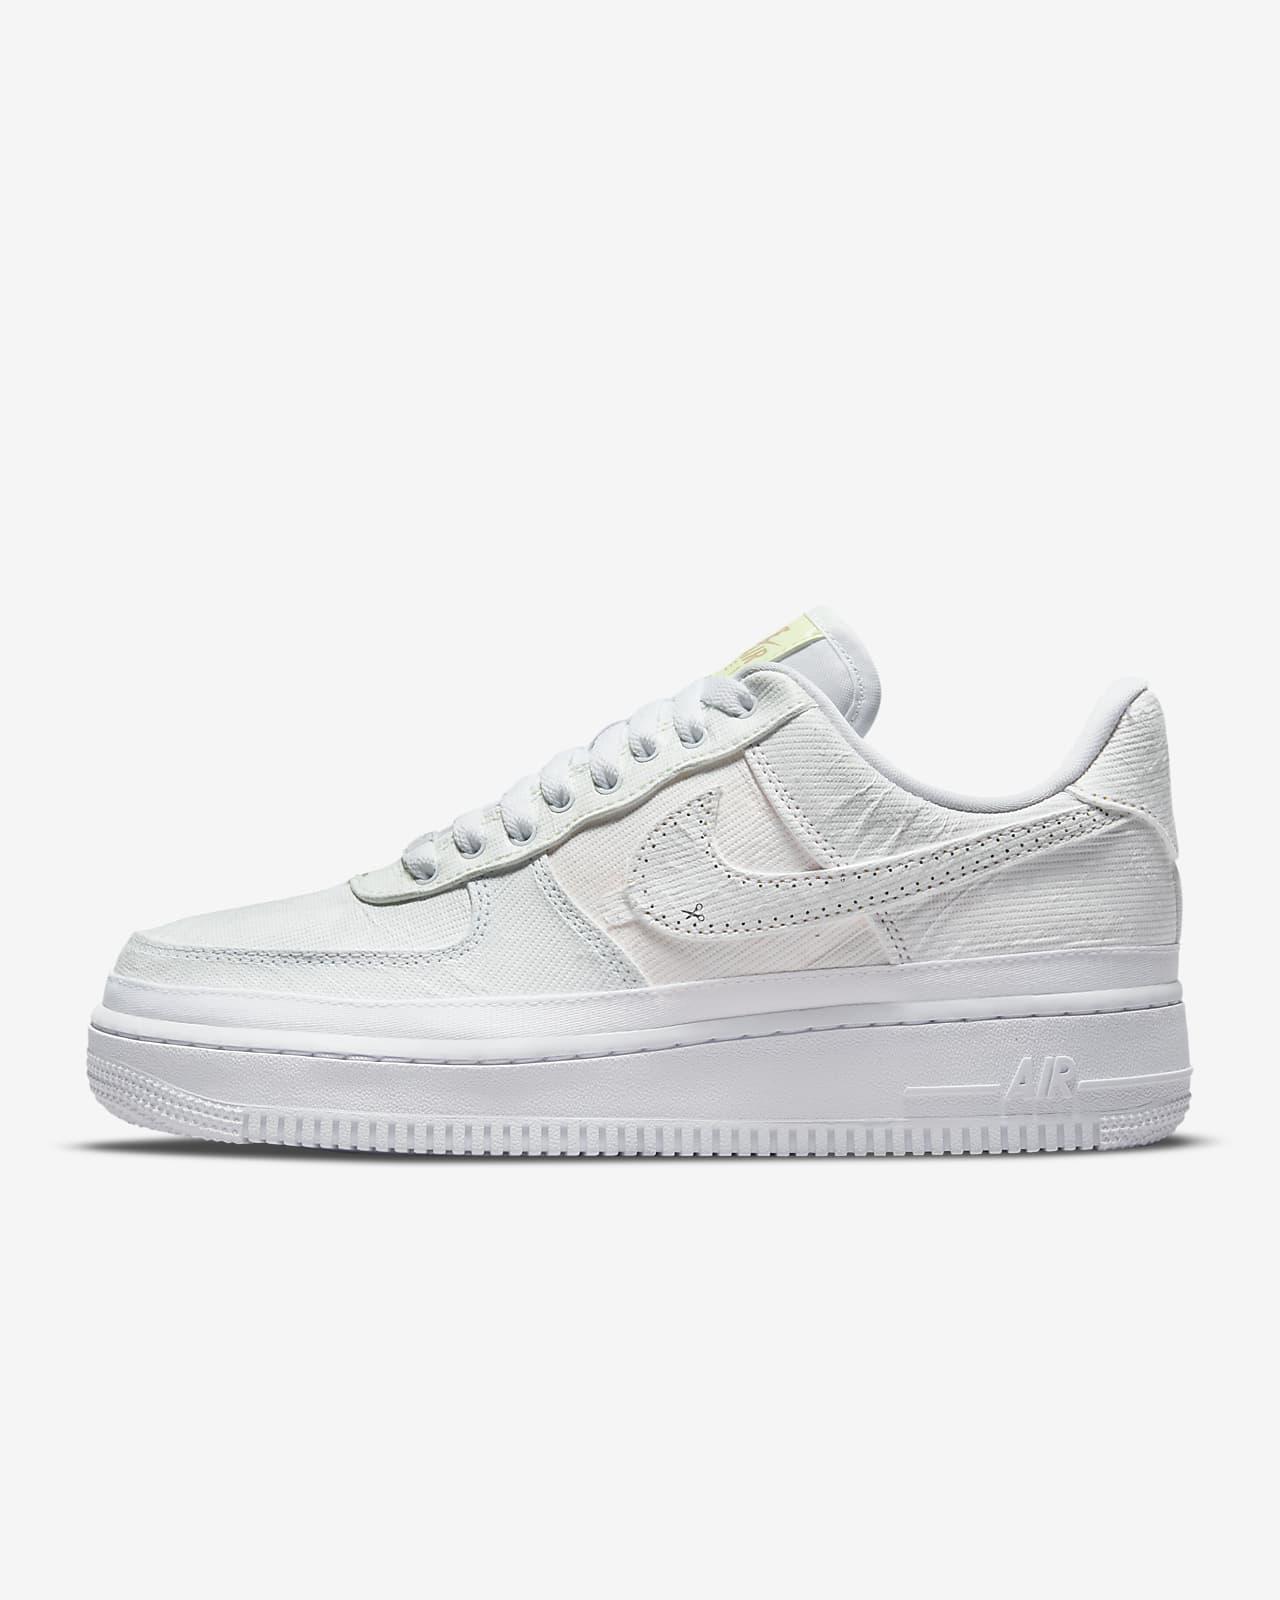 Nike Air Force 1 '07 Premium Women's Shoe